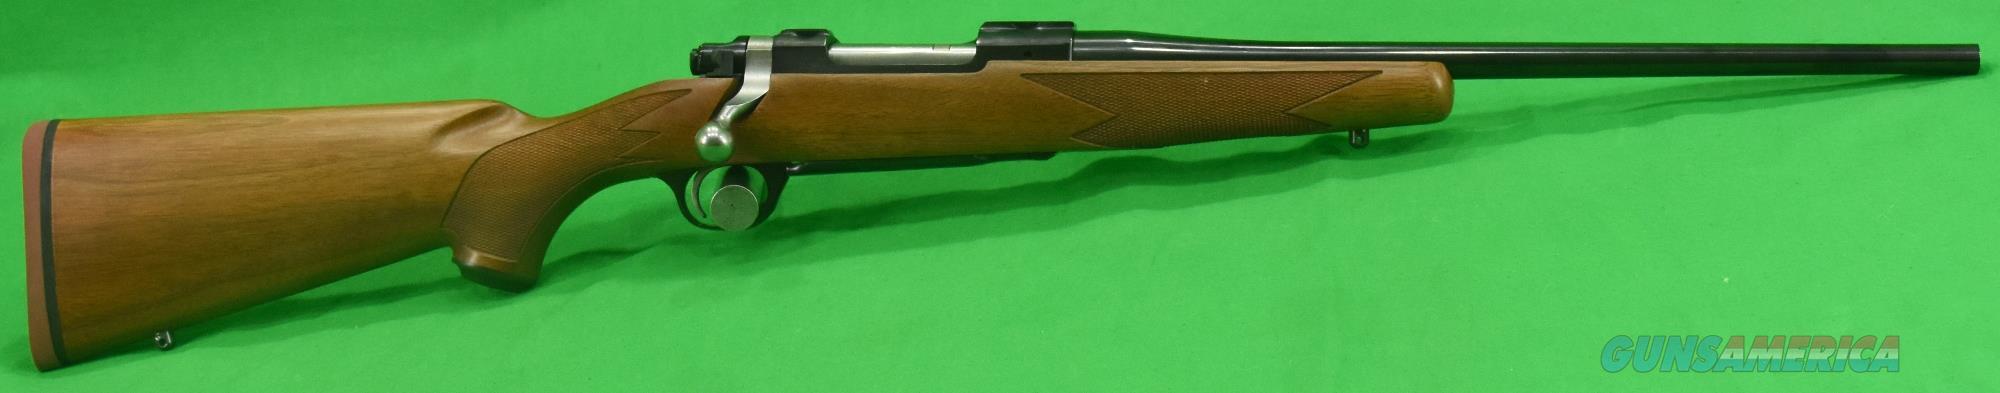 M77 Hawkeye Compact Walnut 7mm-08 16.5In  37140  Guns > Pistols > S Misc Pistols